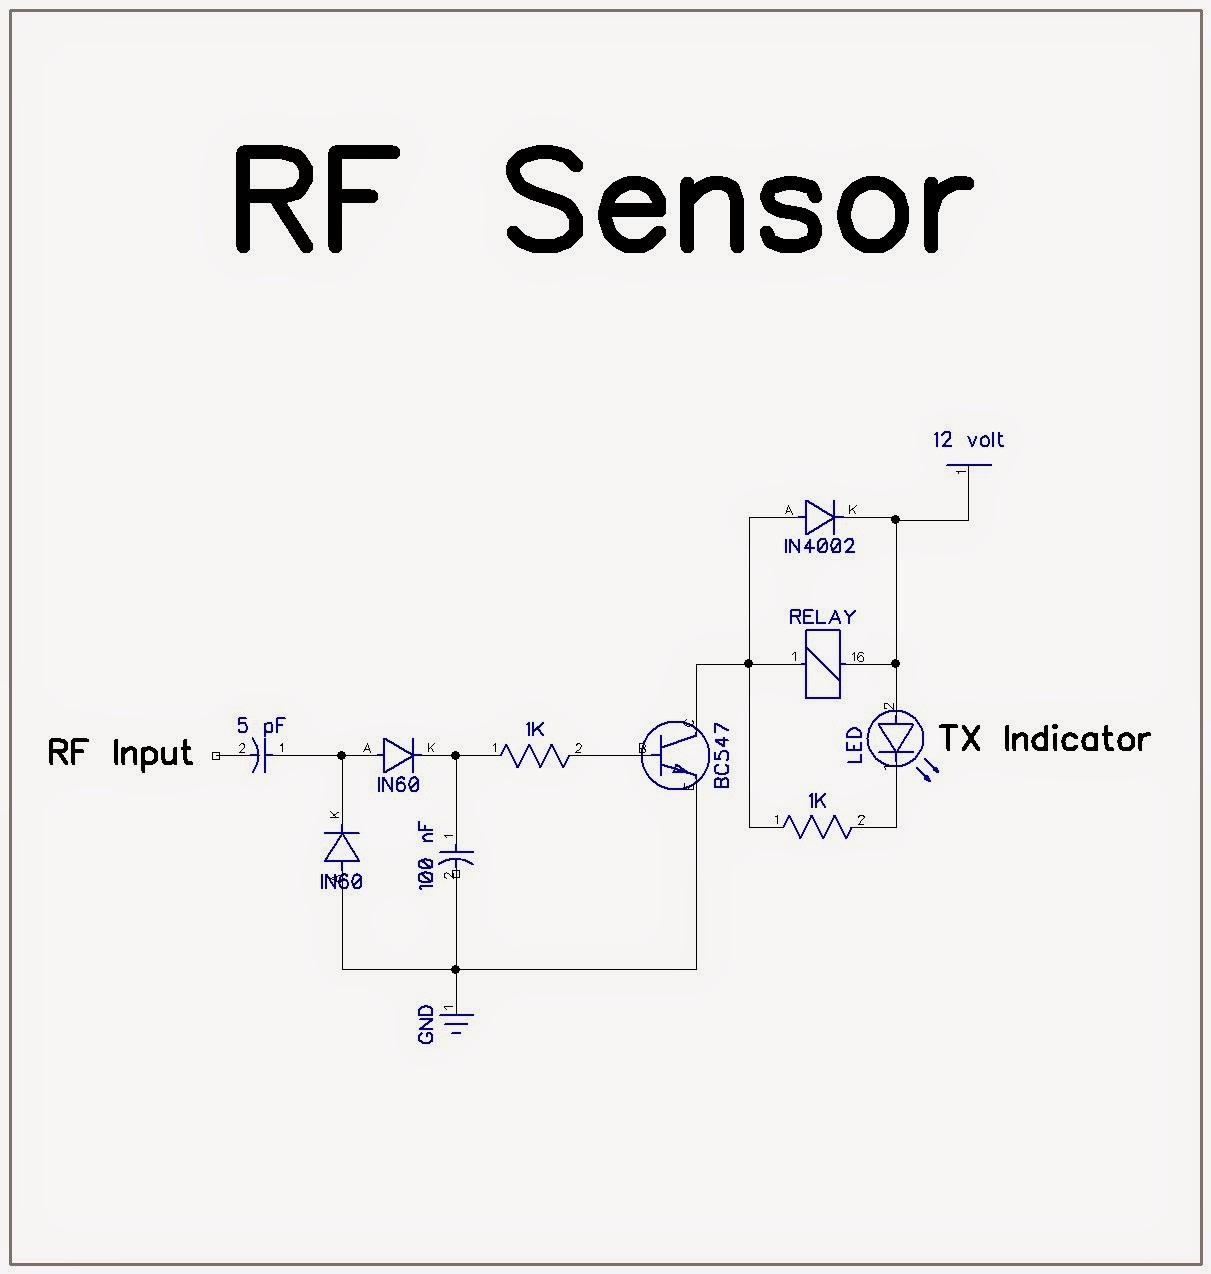 Januari 2015 Fm 70 Mhz 70mhz Rf Power Amplifier Sedangkan Rangkaian Booster Amplifiernya Adalah Seperti Di Bawah Ini